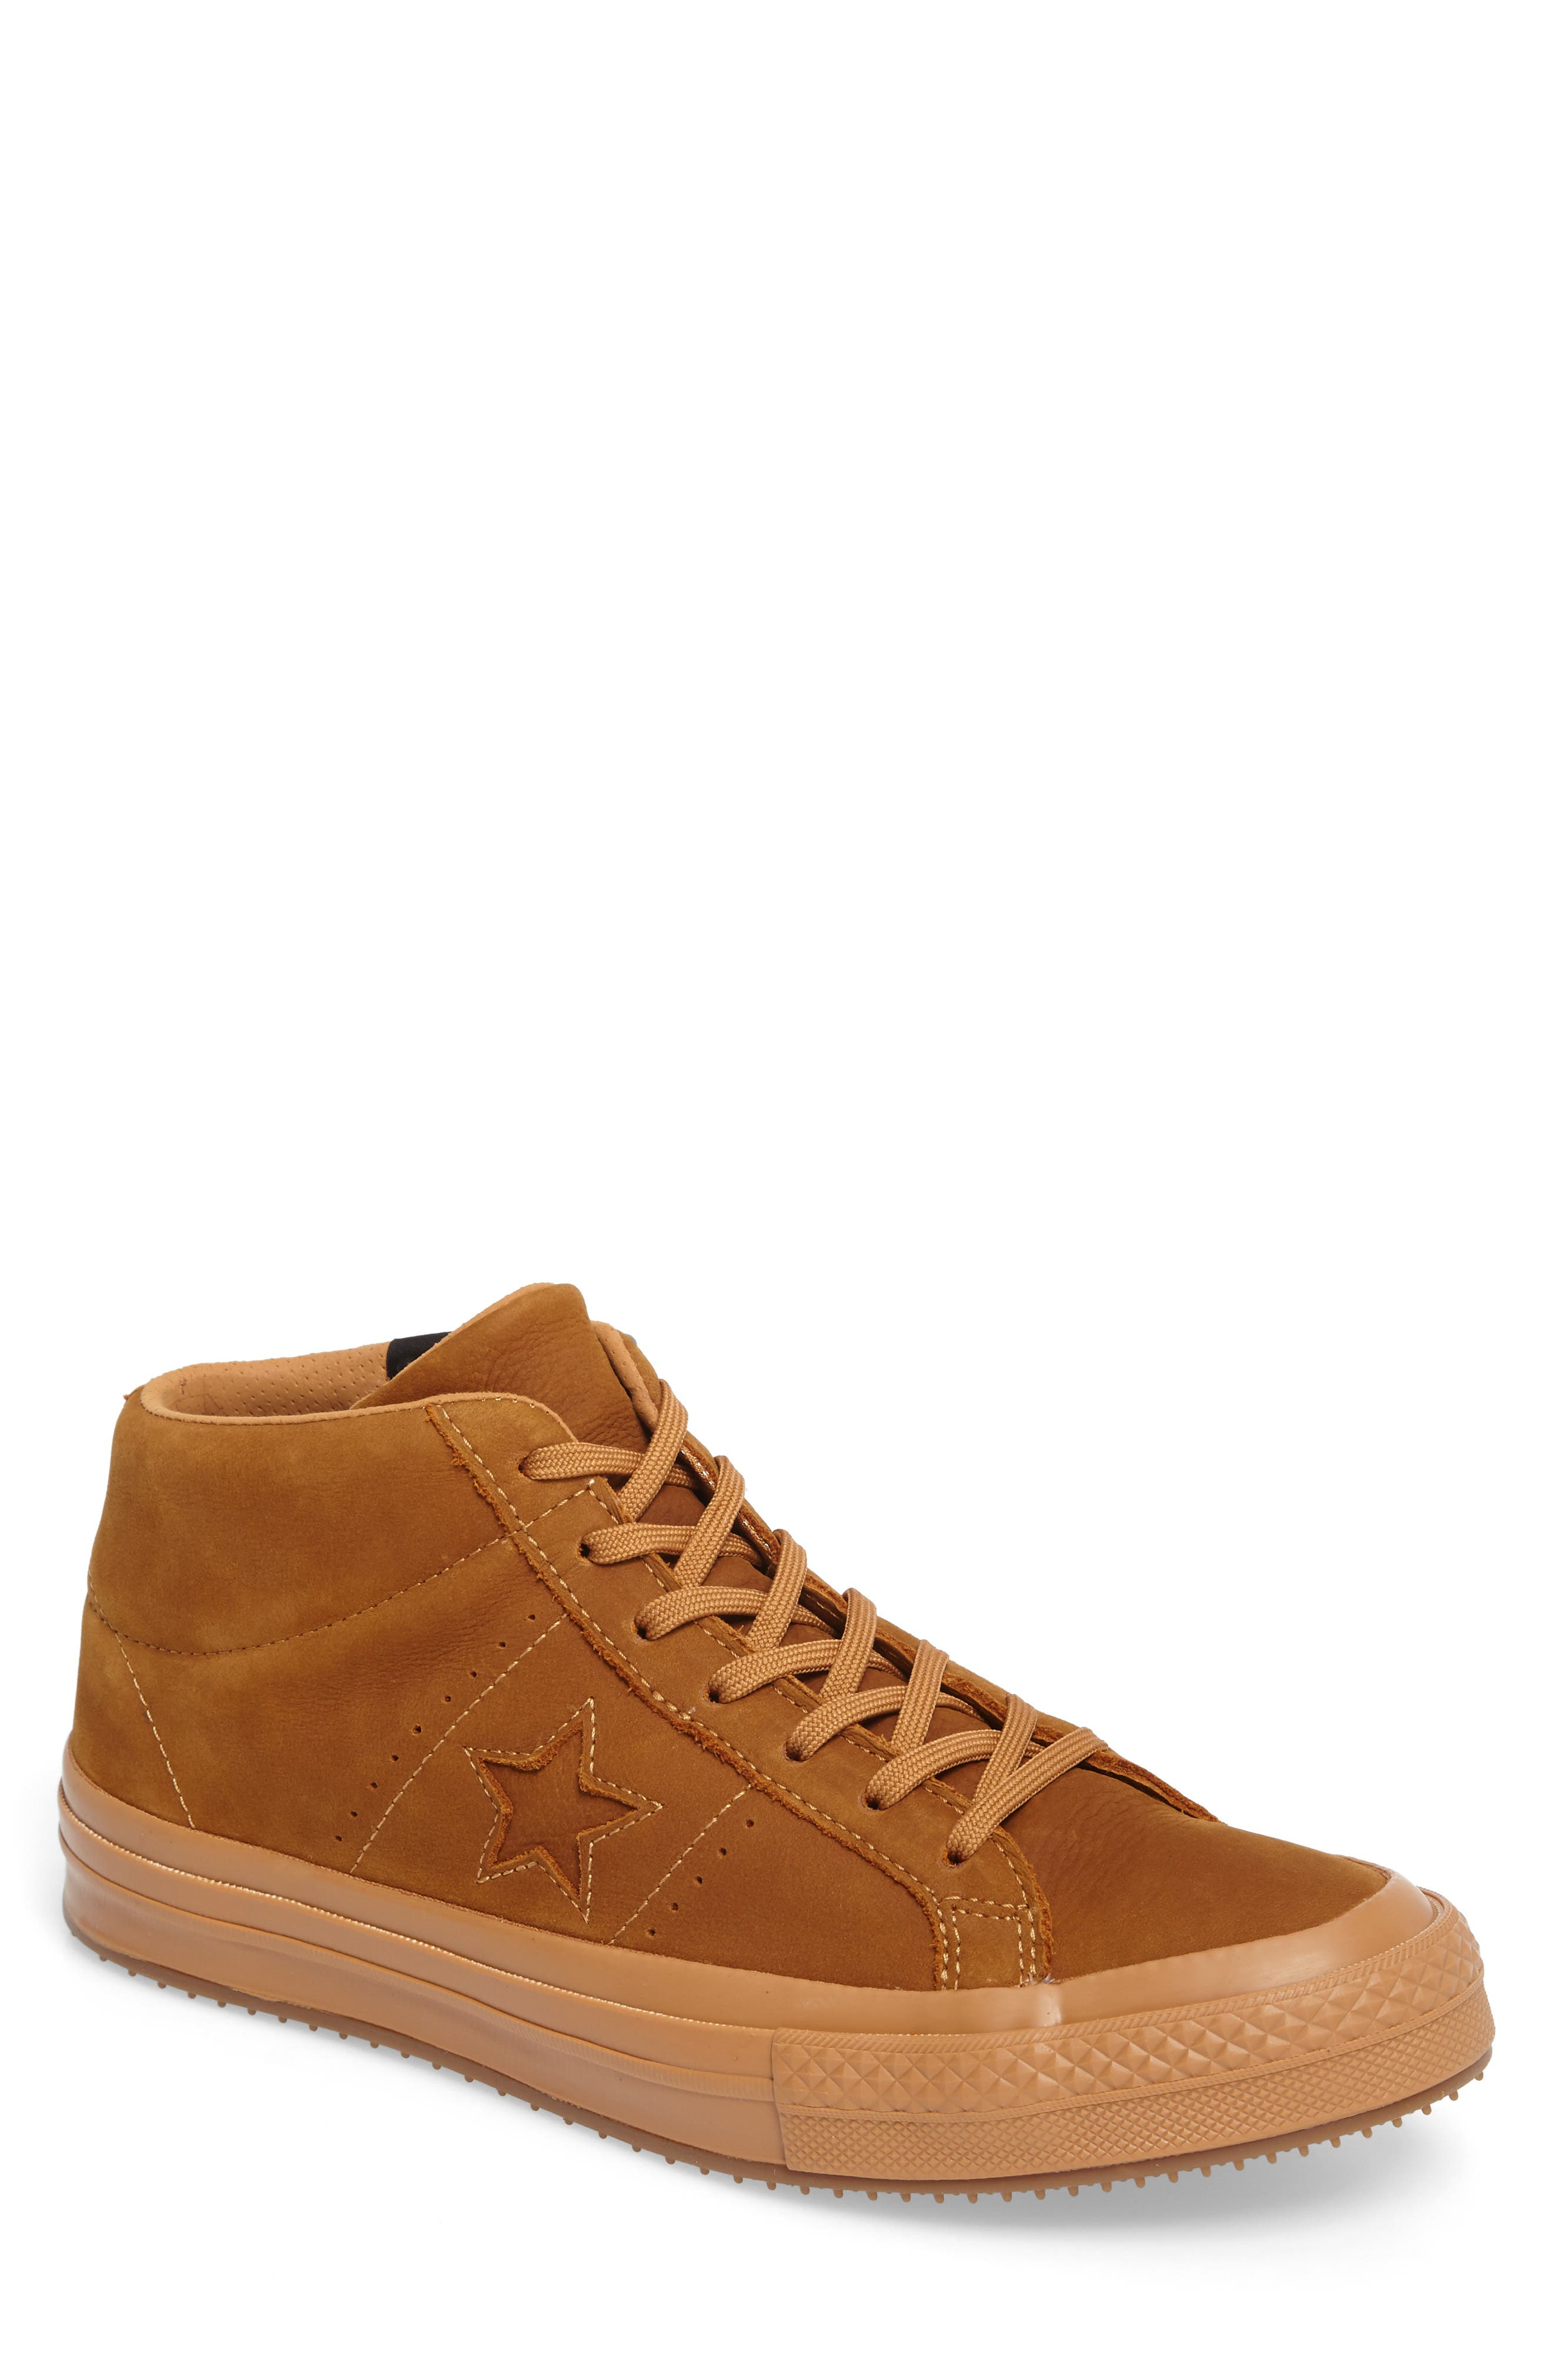 Main Image - Converse One Star Mid Sneaker (Men)